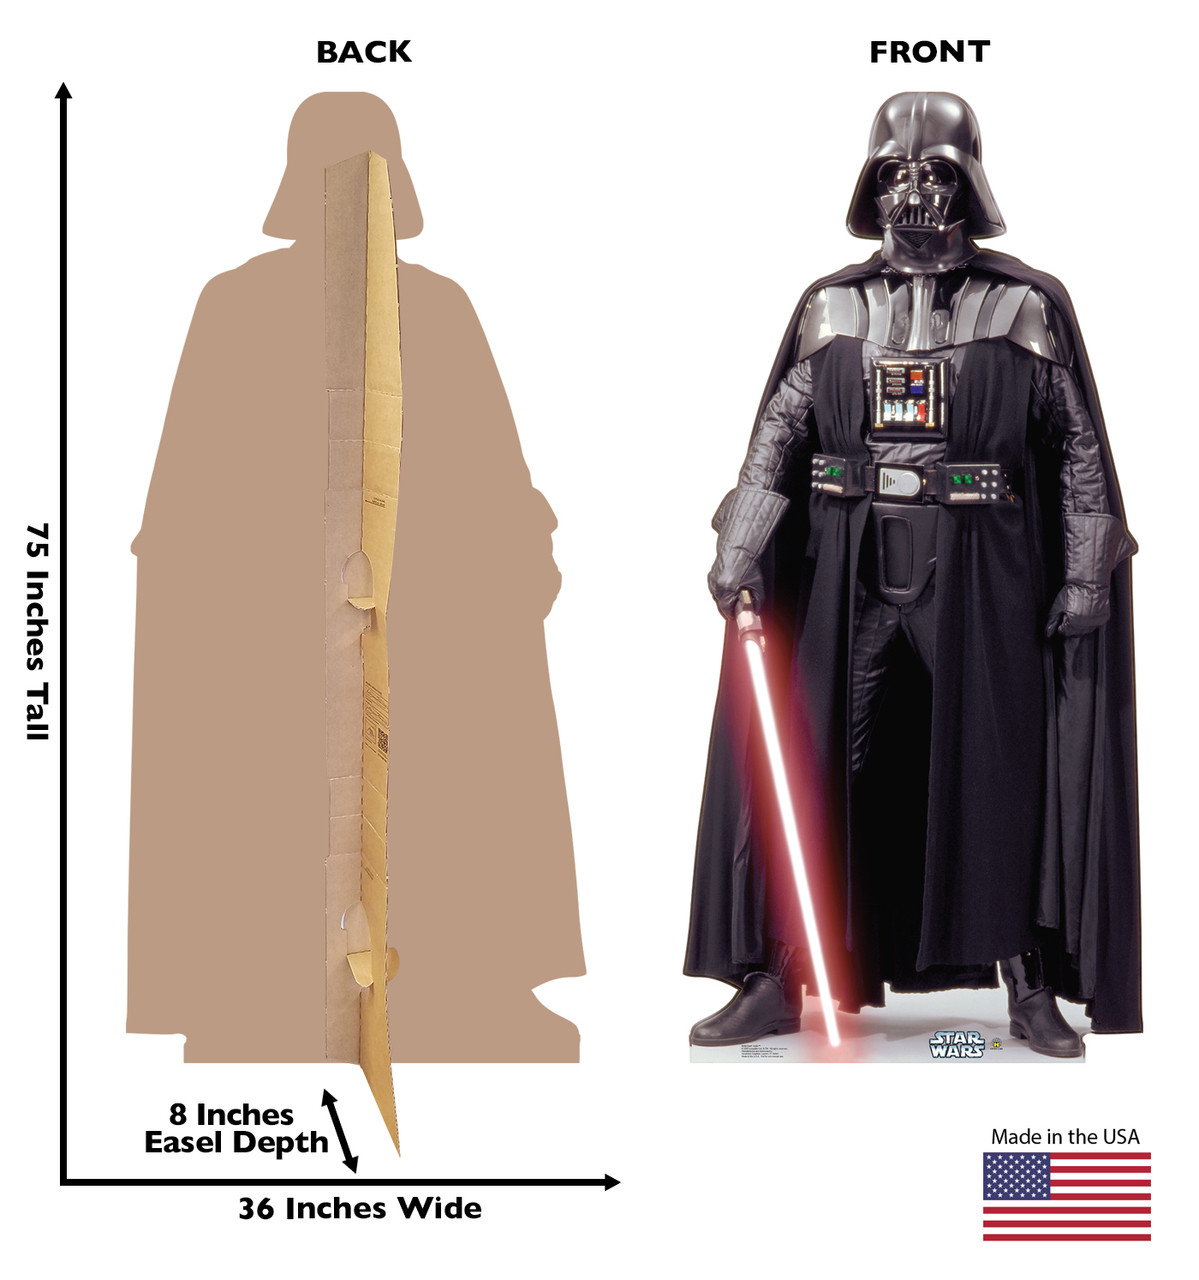 Darth Vader Cardboard Cutout front and back view